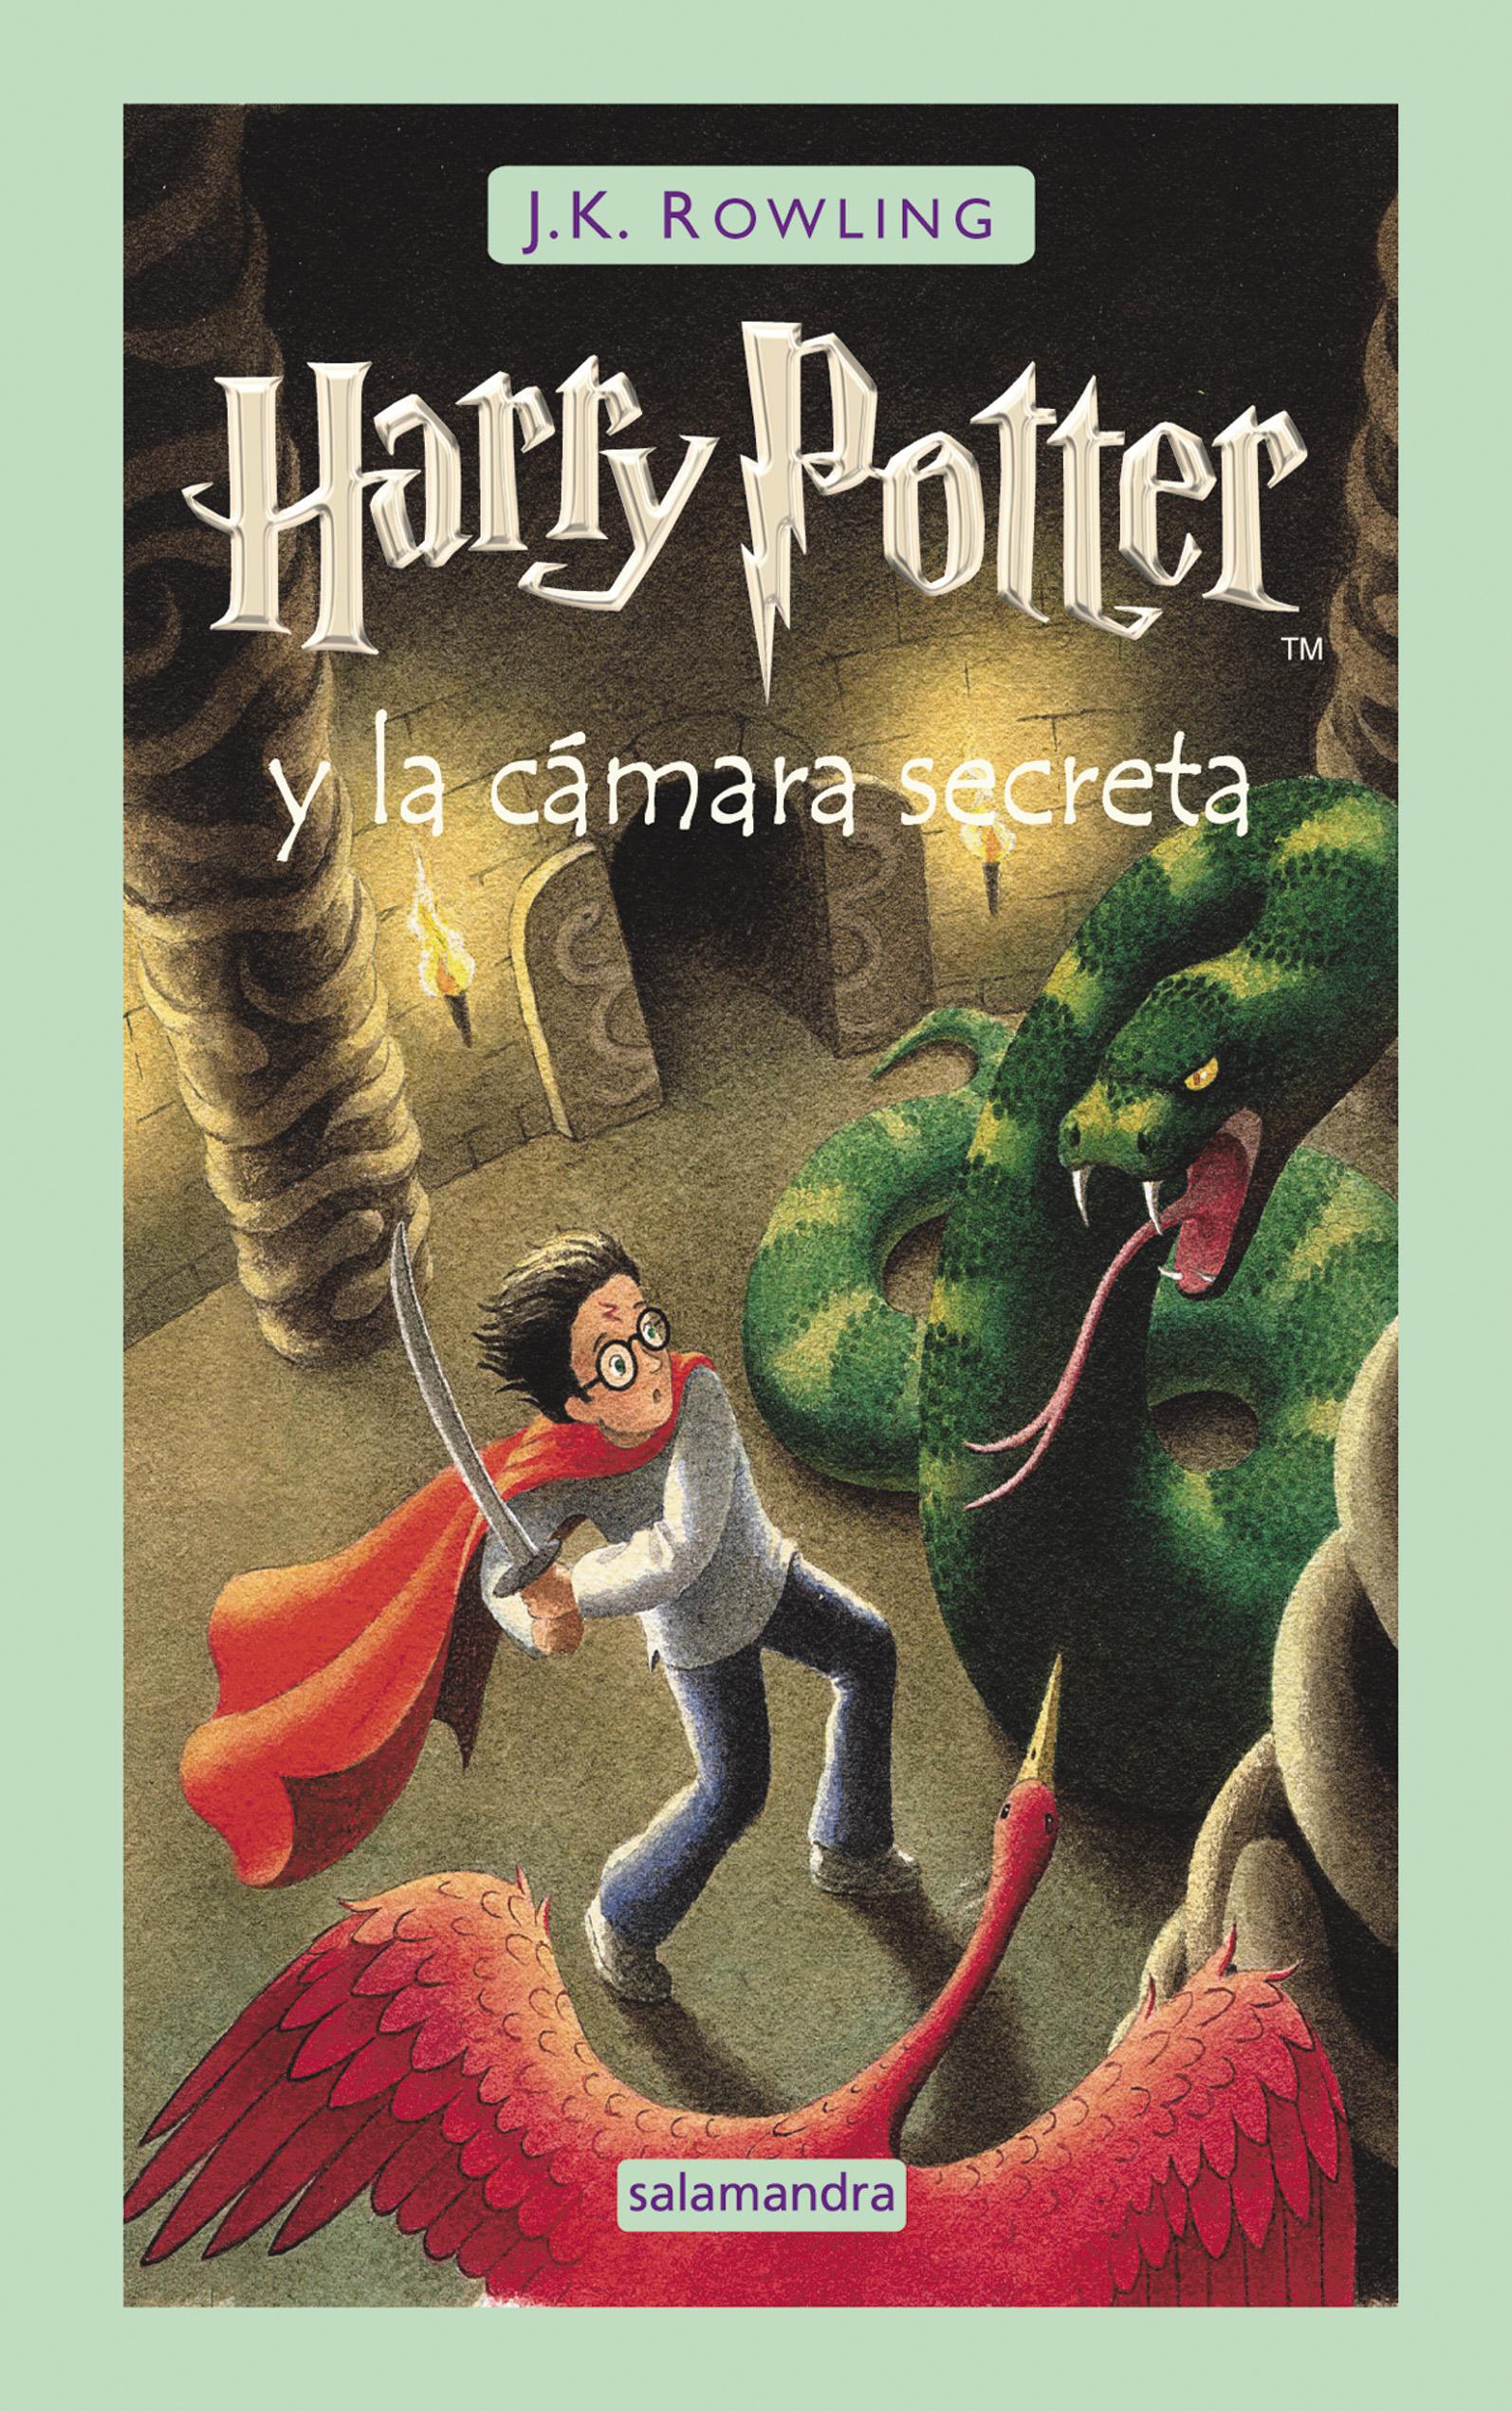 Harry Potter y la cámara secreta | Harry Potter Wiki